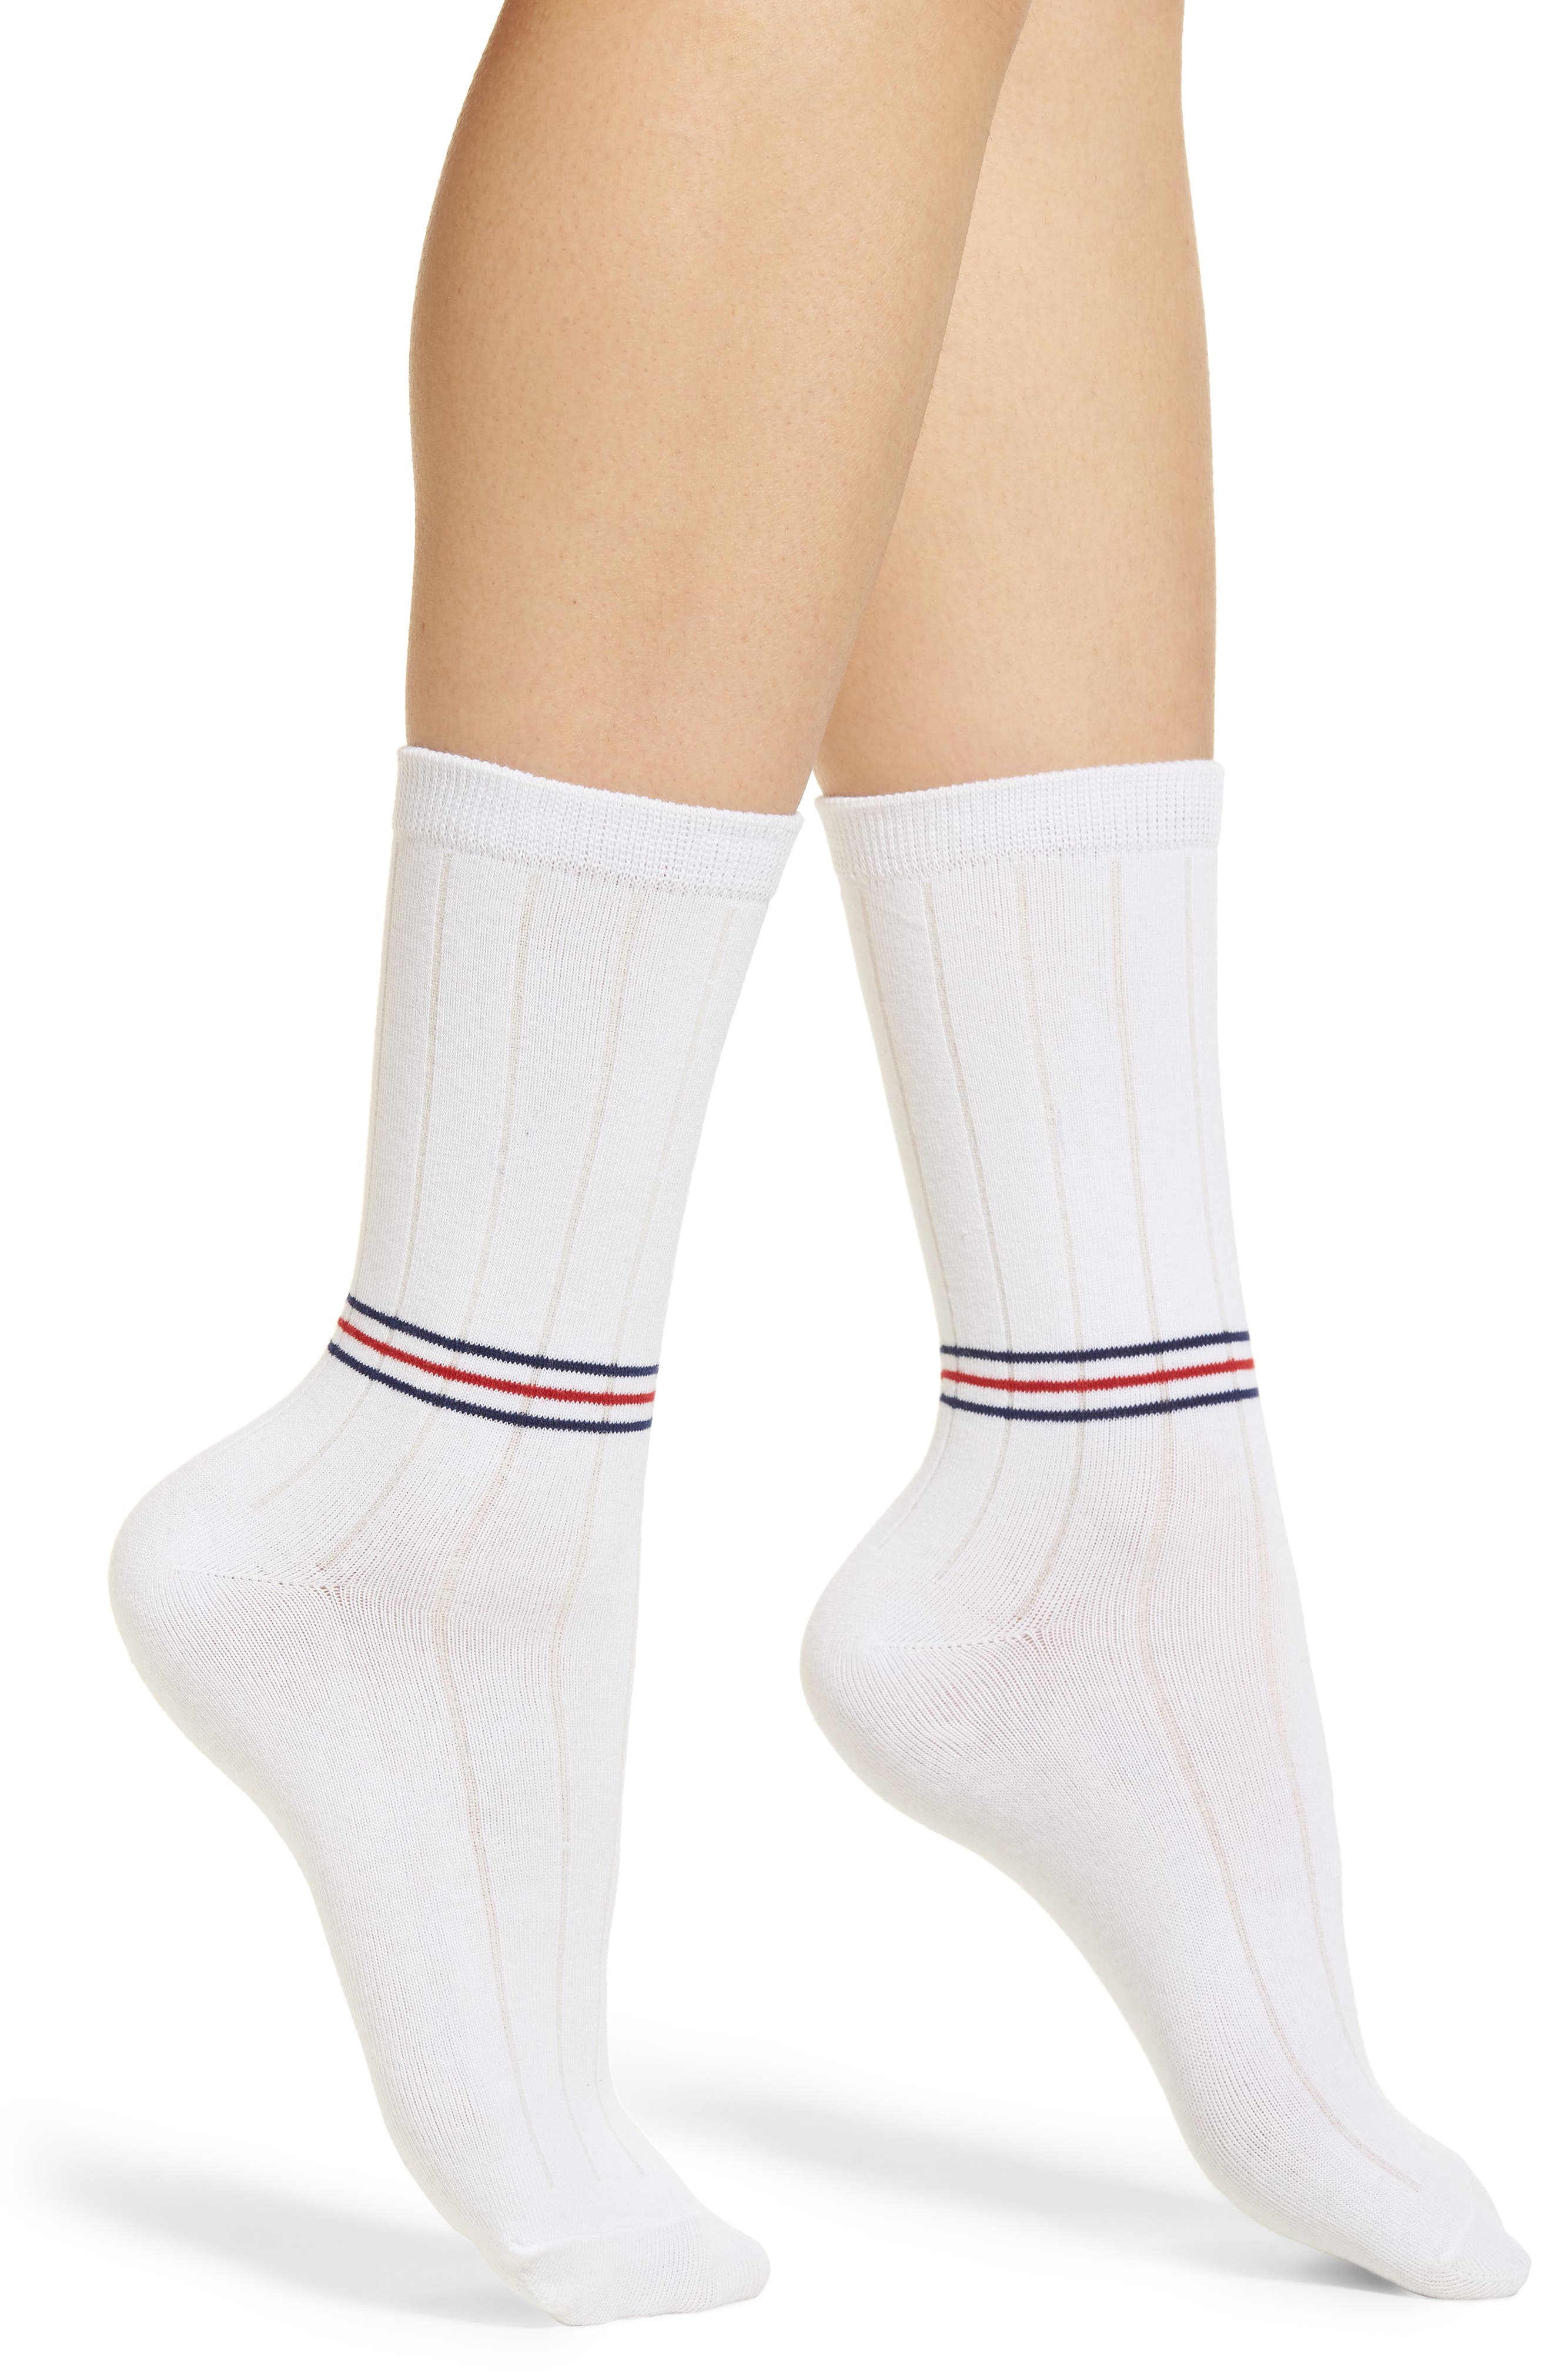 Rocky Classic Crew Socks,                         Main,                         color, 100